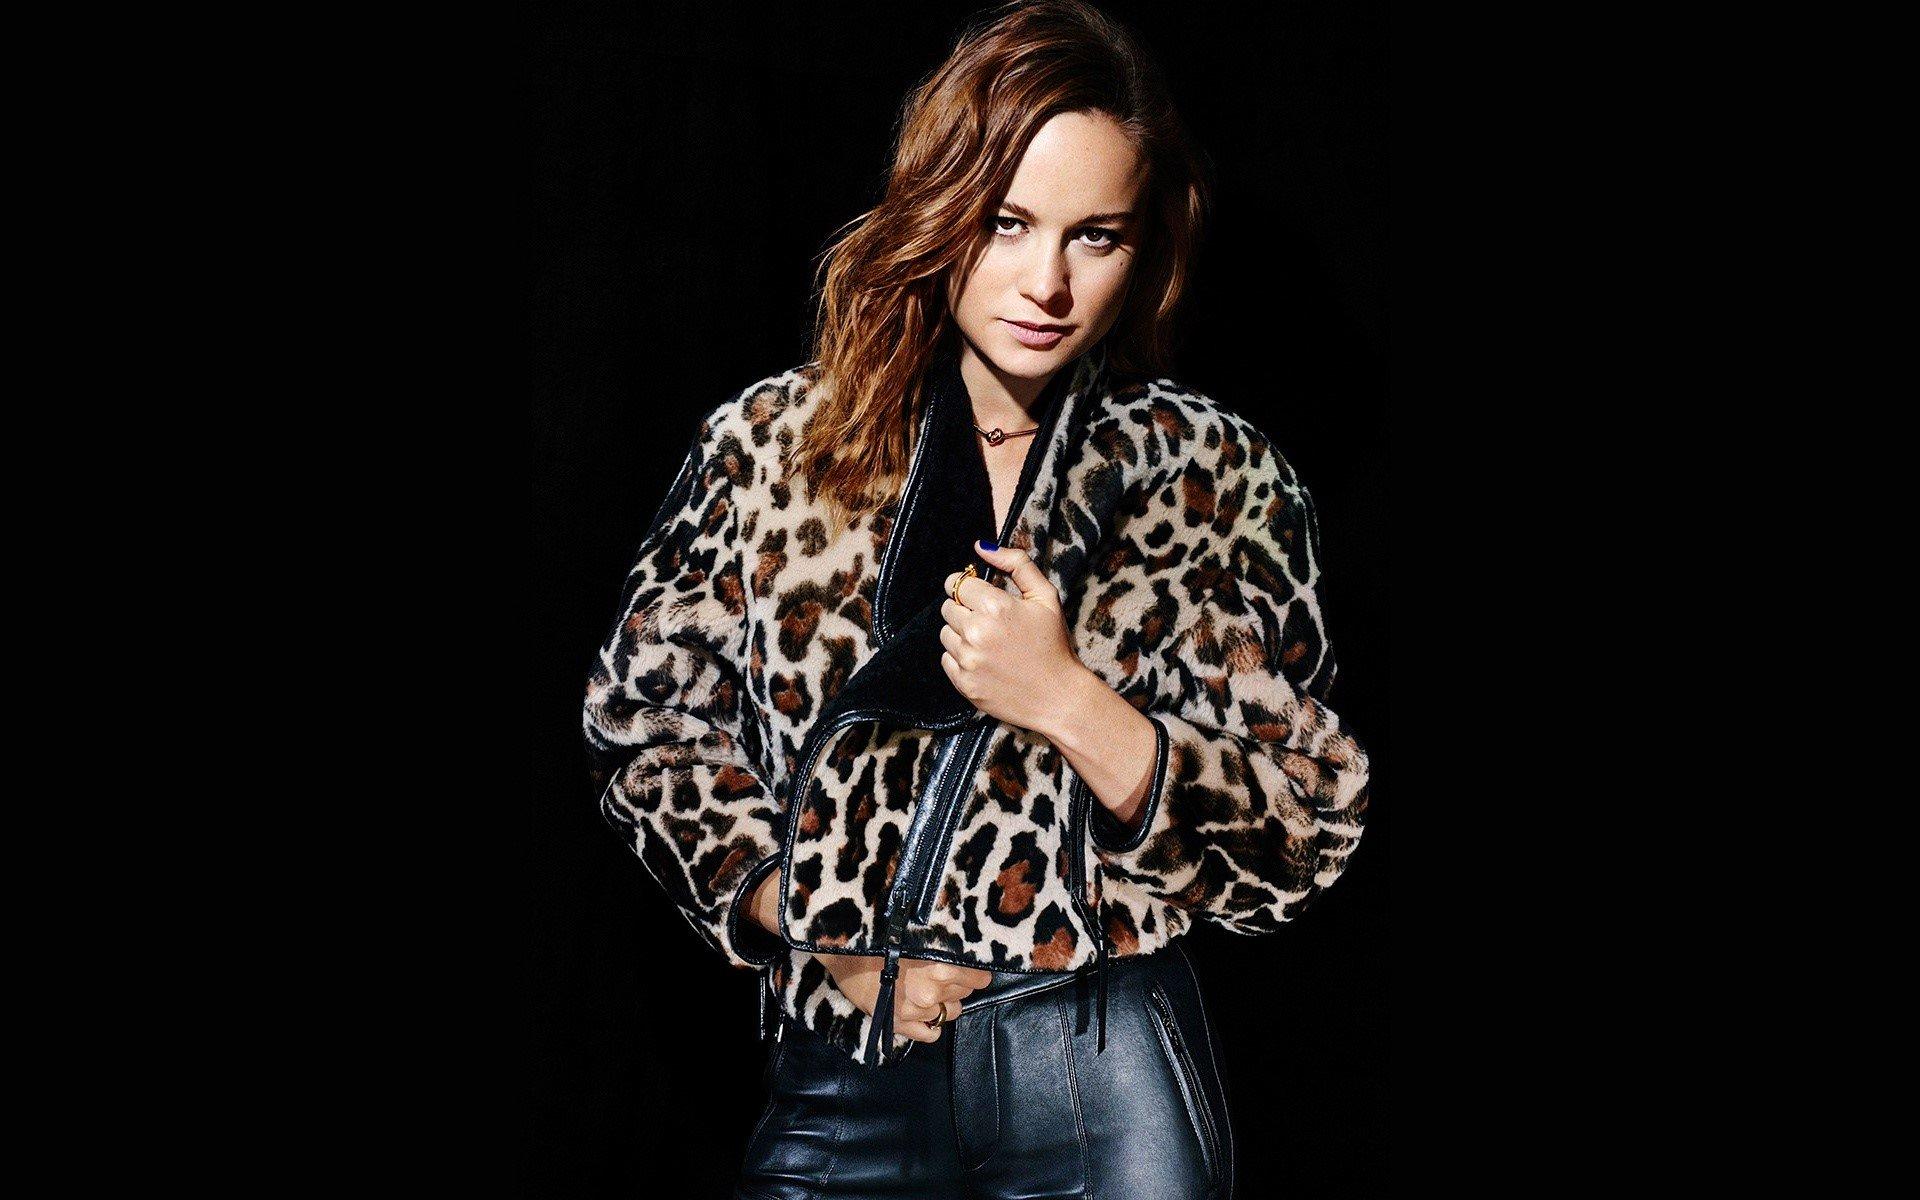 Fondos de pantalla Brie Larson